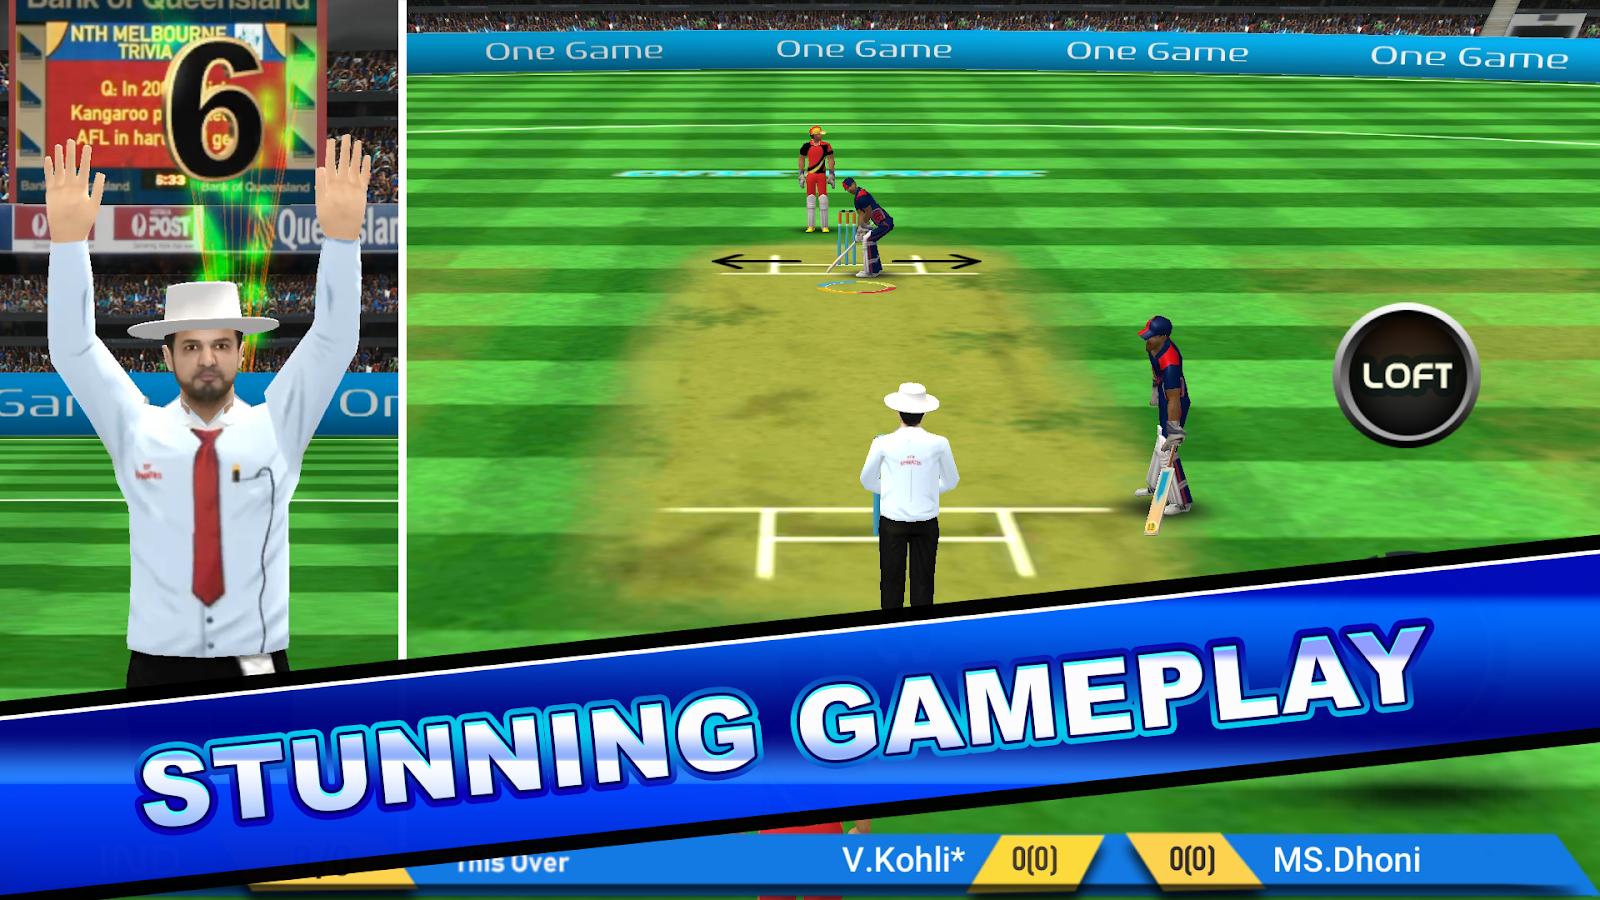 cricket game download apk 2019